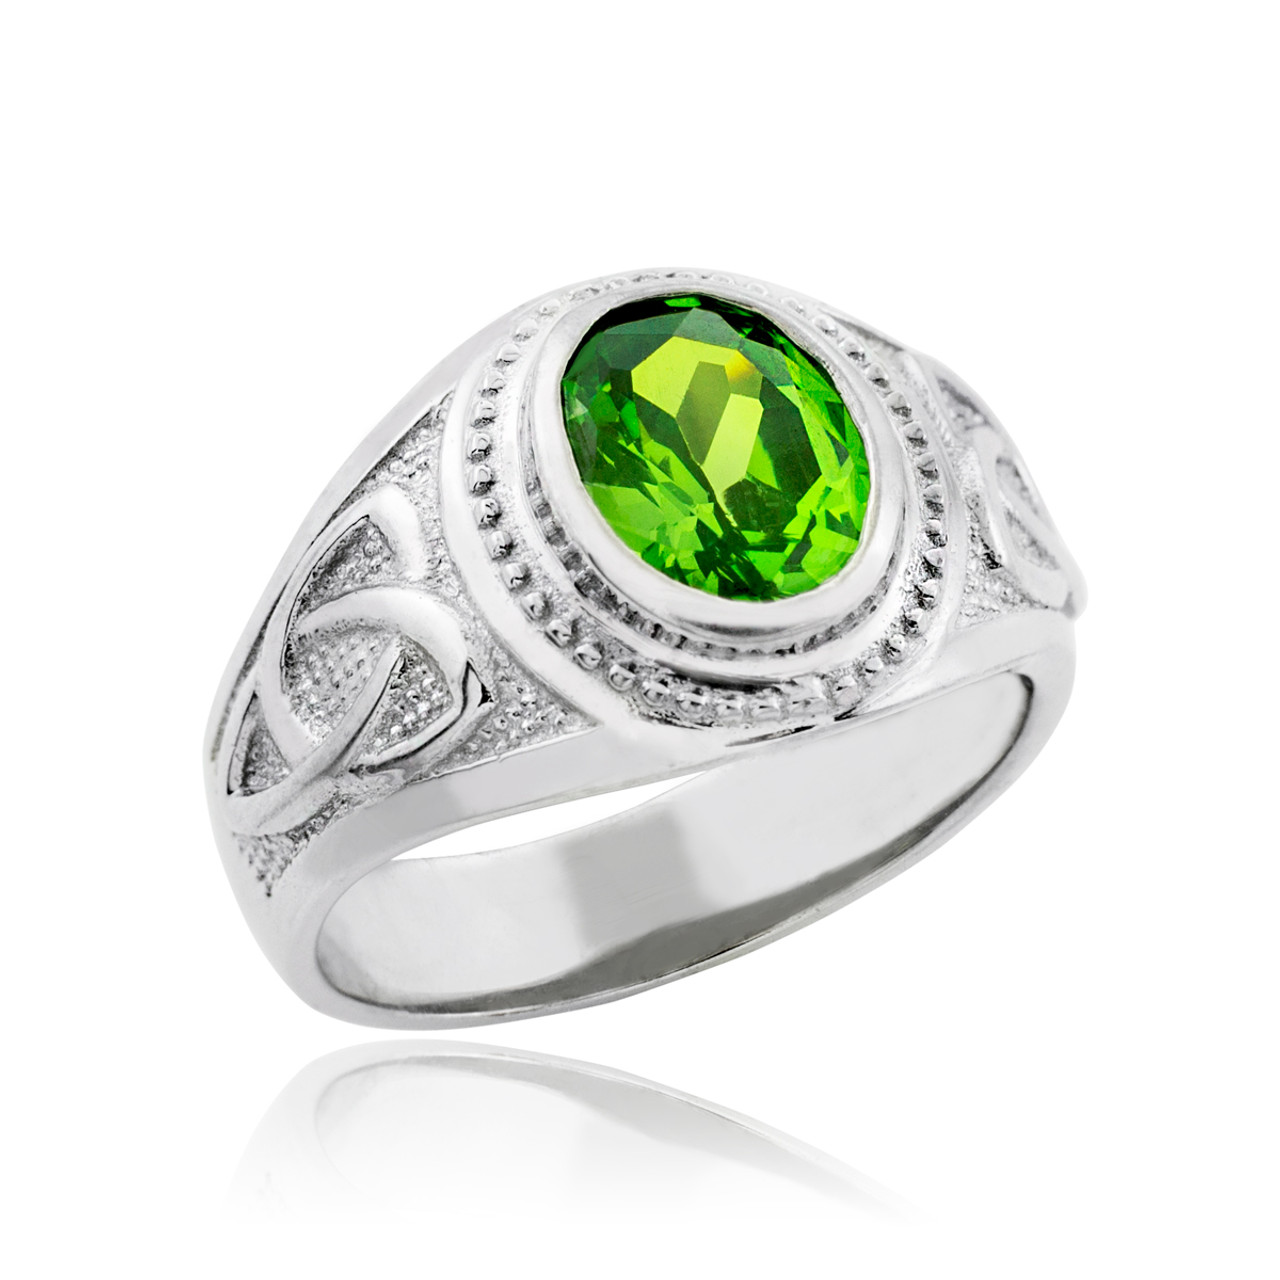 4aaf566a28d6d Sterling Silver Celtic Emerald Green CZ Men's Ring